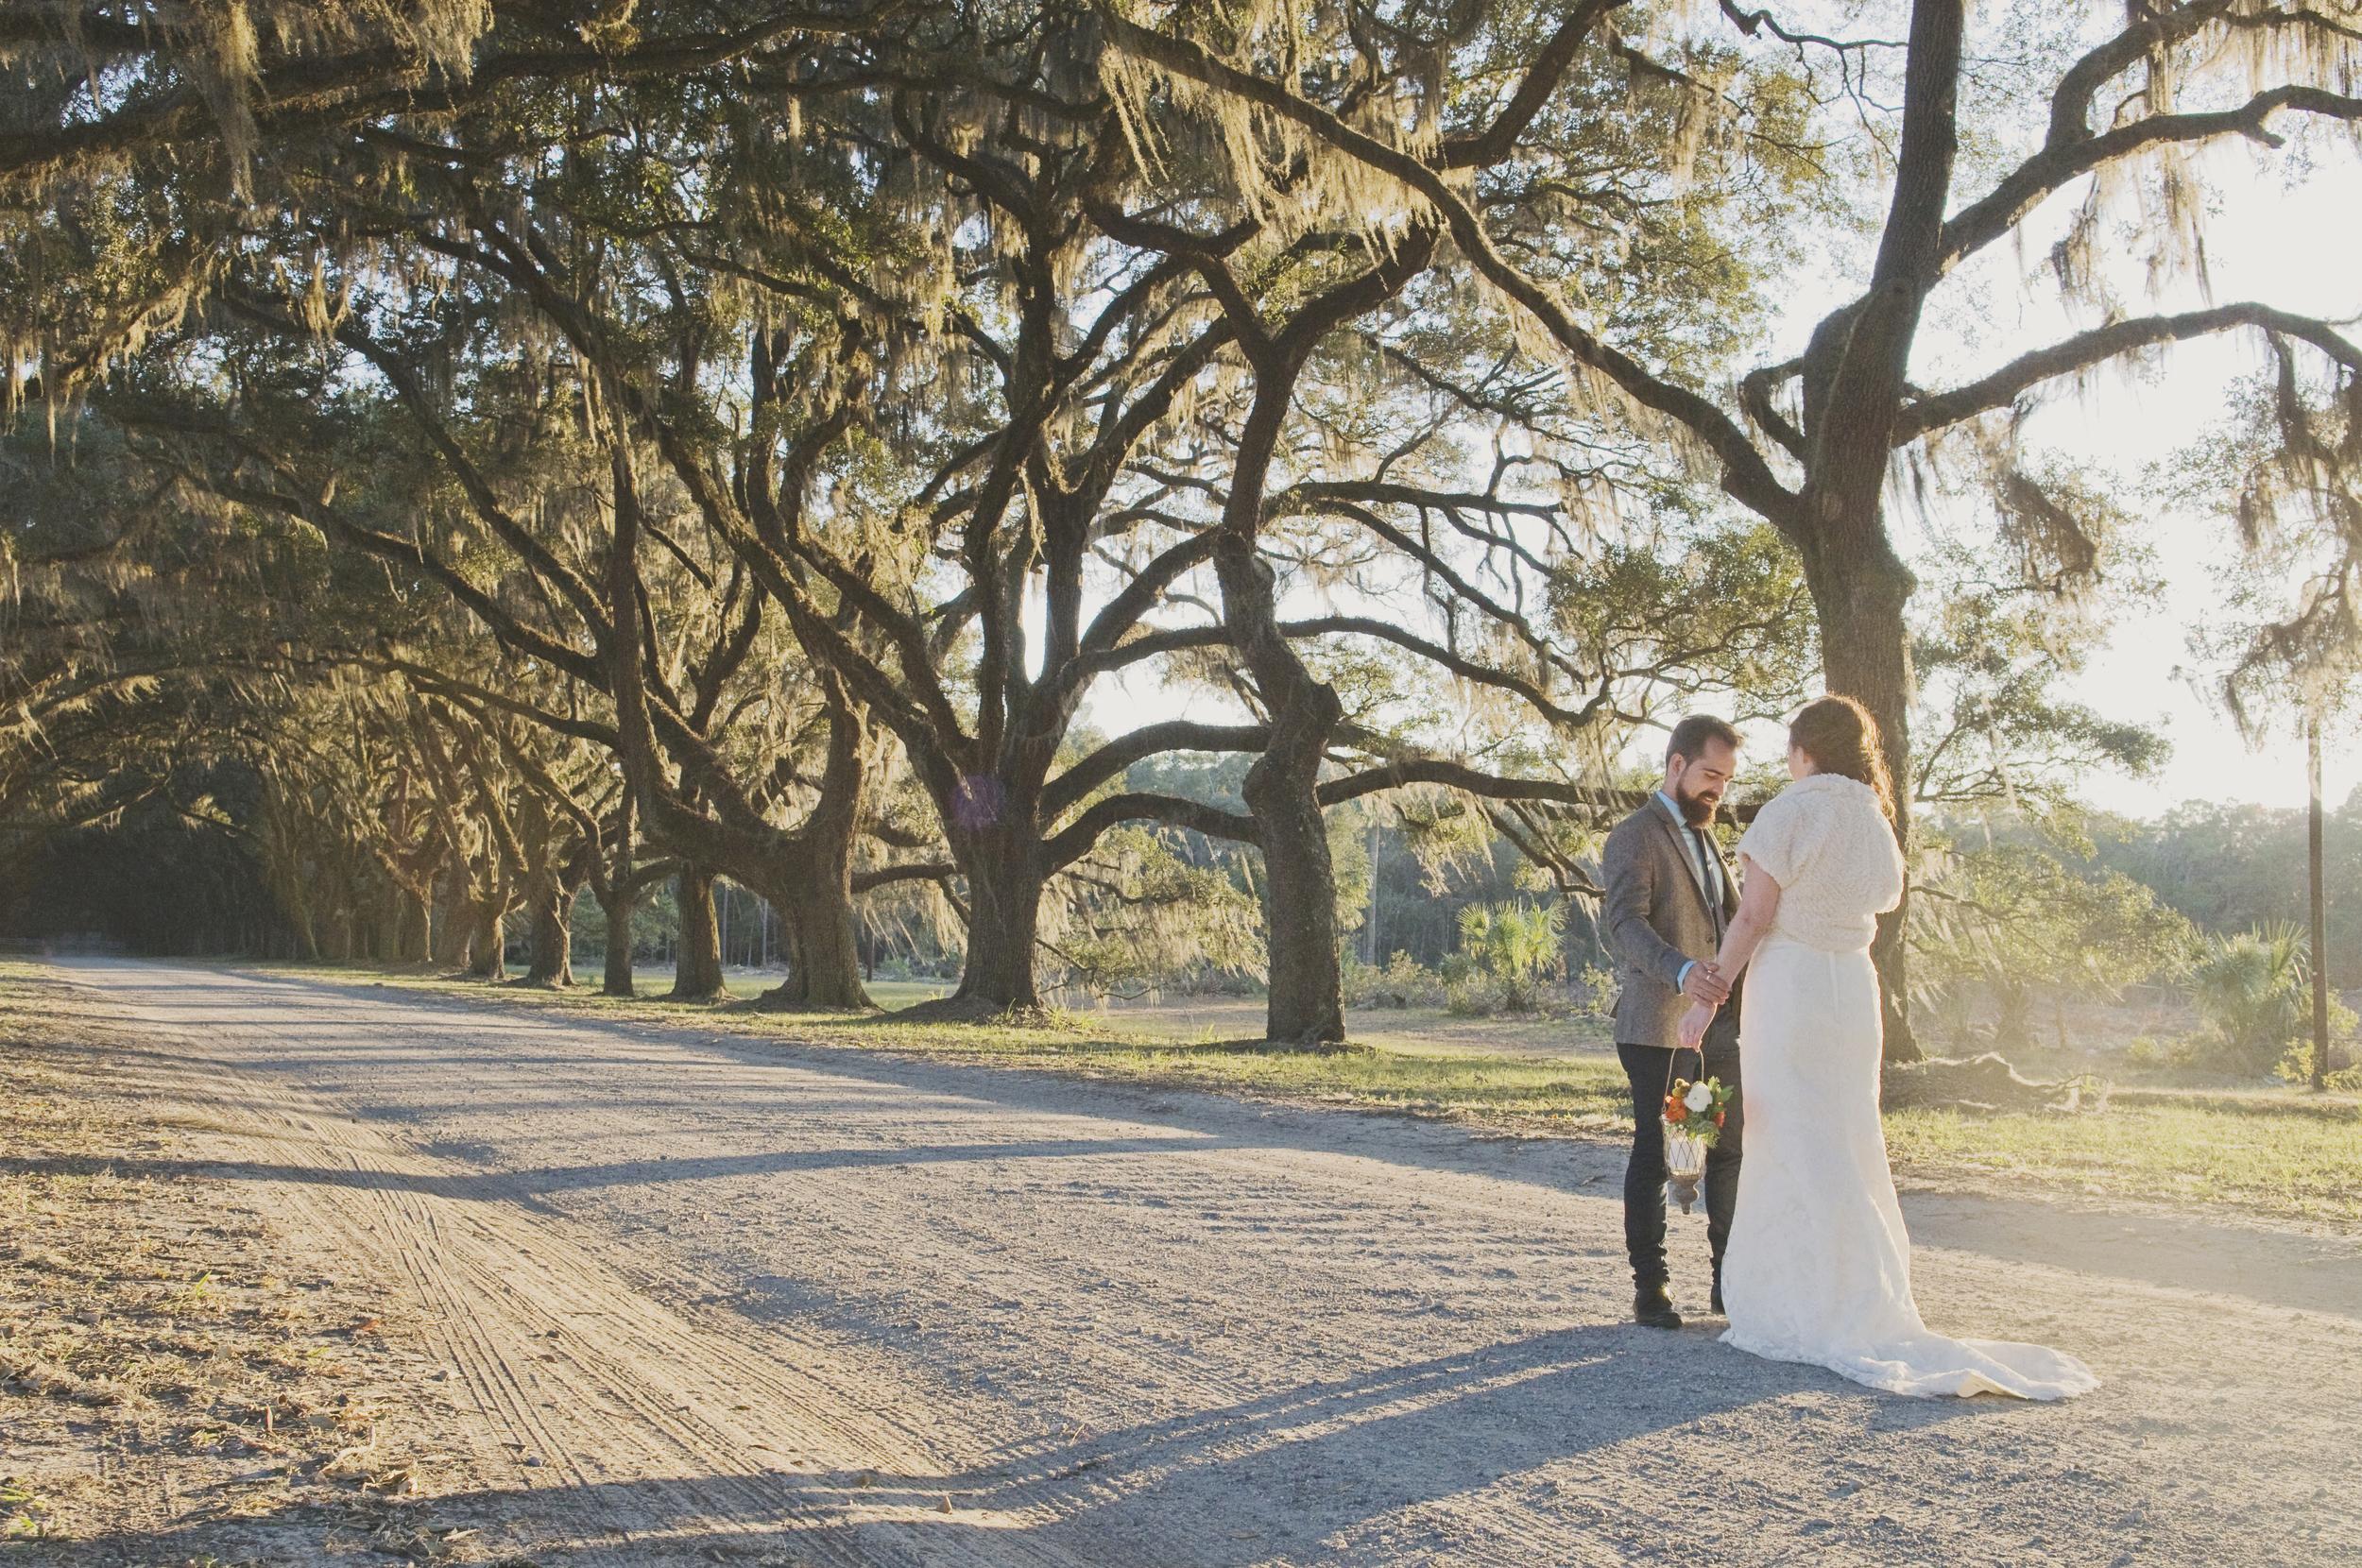 amber-and-david-ivory-and-beau-bridal-boutique-lytle-foto-savannah-wedding-dresses-savannah-wedding-planner-savannah-event-designer-savannah-weddings-wormsloe-wedding-cohens-retreat-wedding-indie-wedding-handmade-wedding-historic-19.jpg